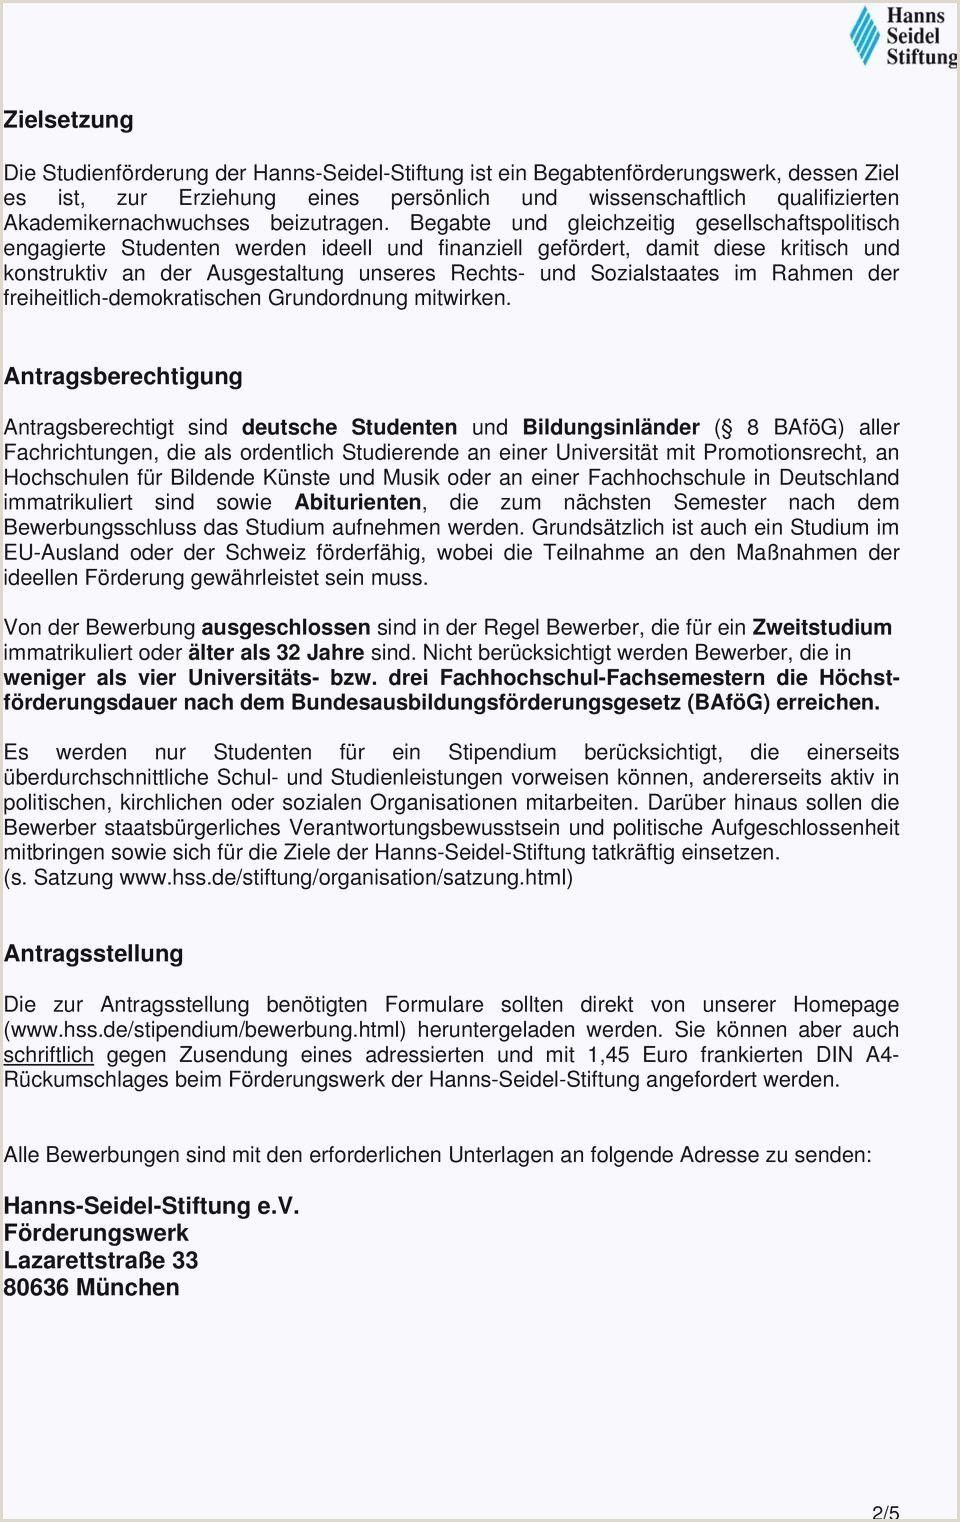 Lebenslauf Vorlage Schuler Openoffice In 2020 Resume Words Resume Template Free Resume Examples